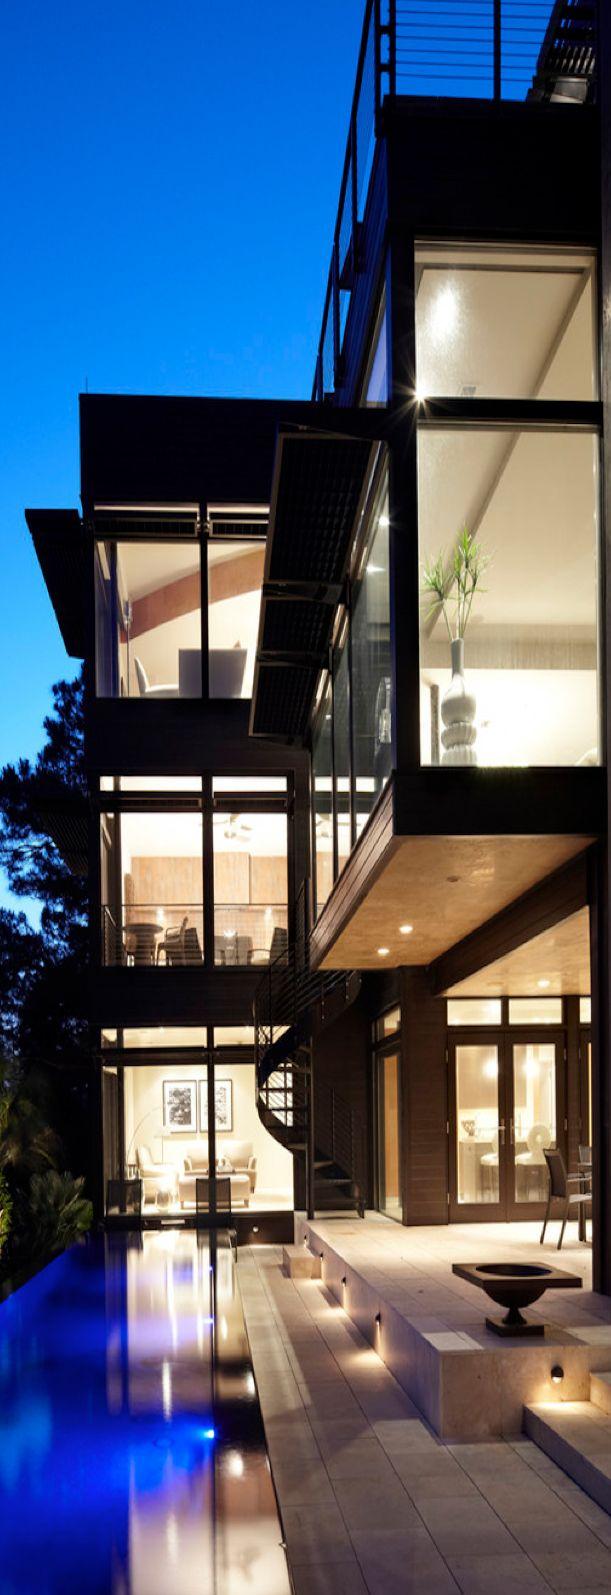 Best Casas Images On Pinterest - House modern interior design